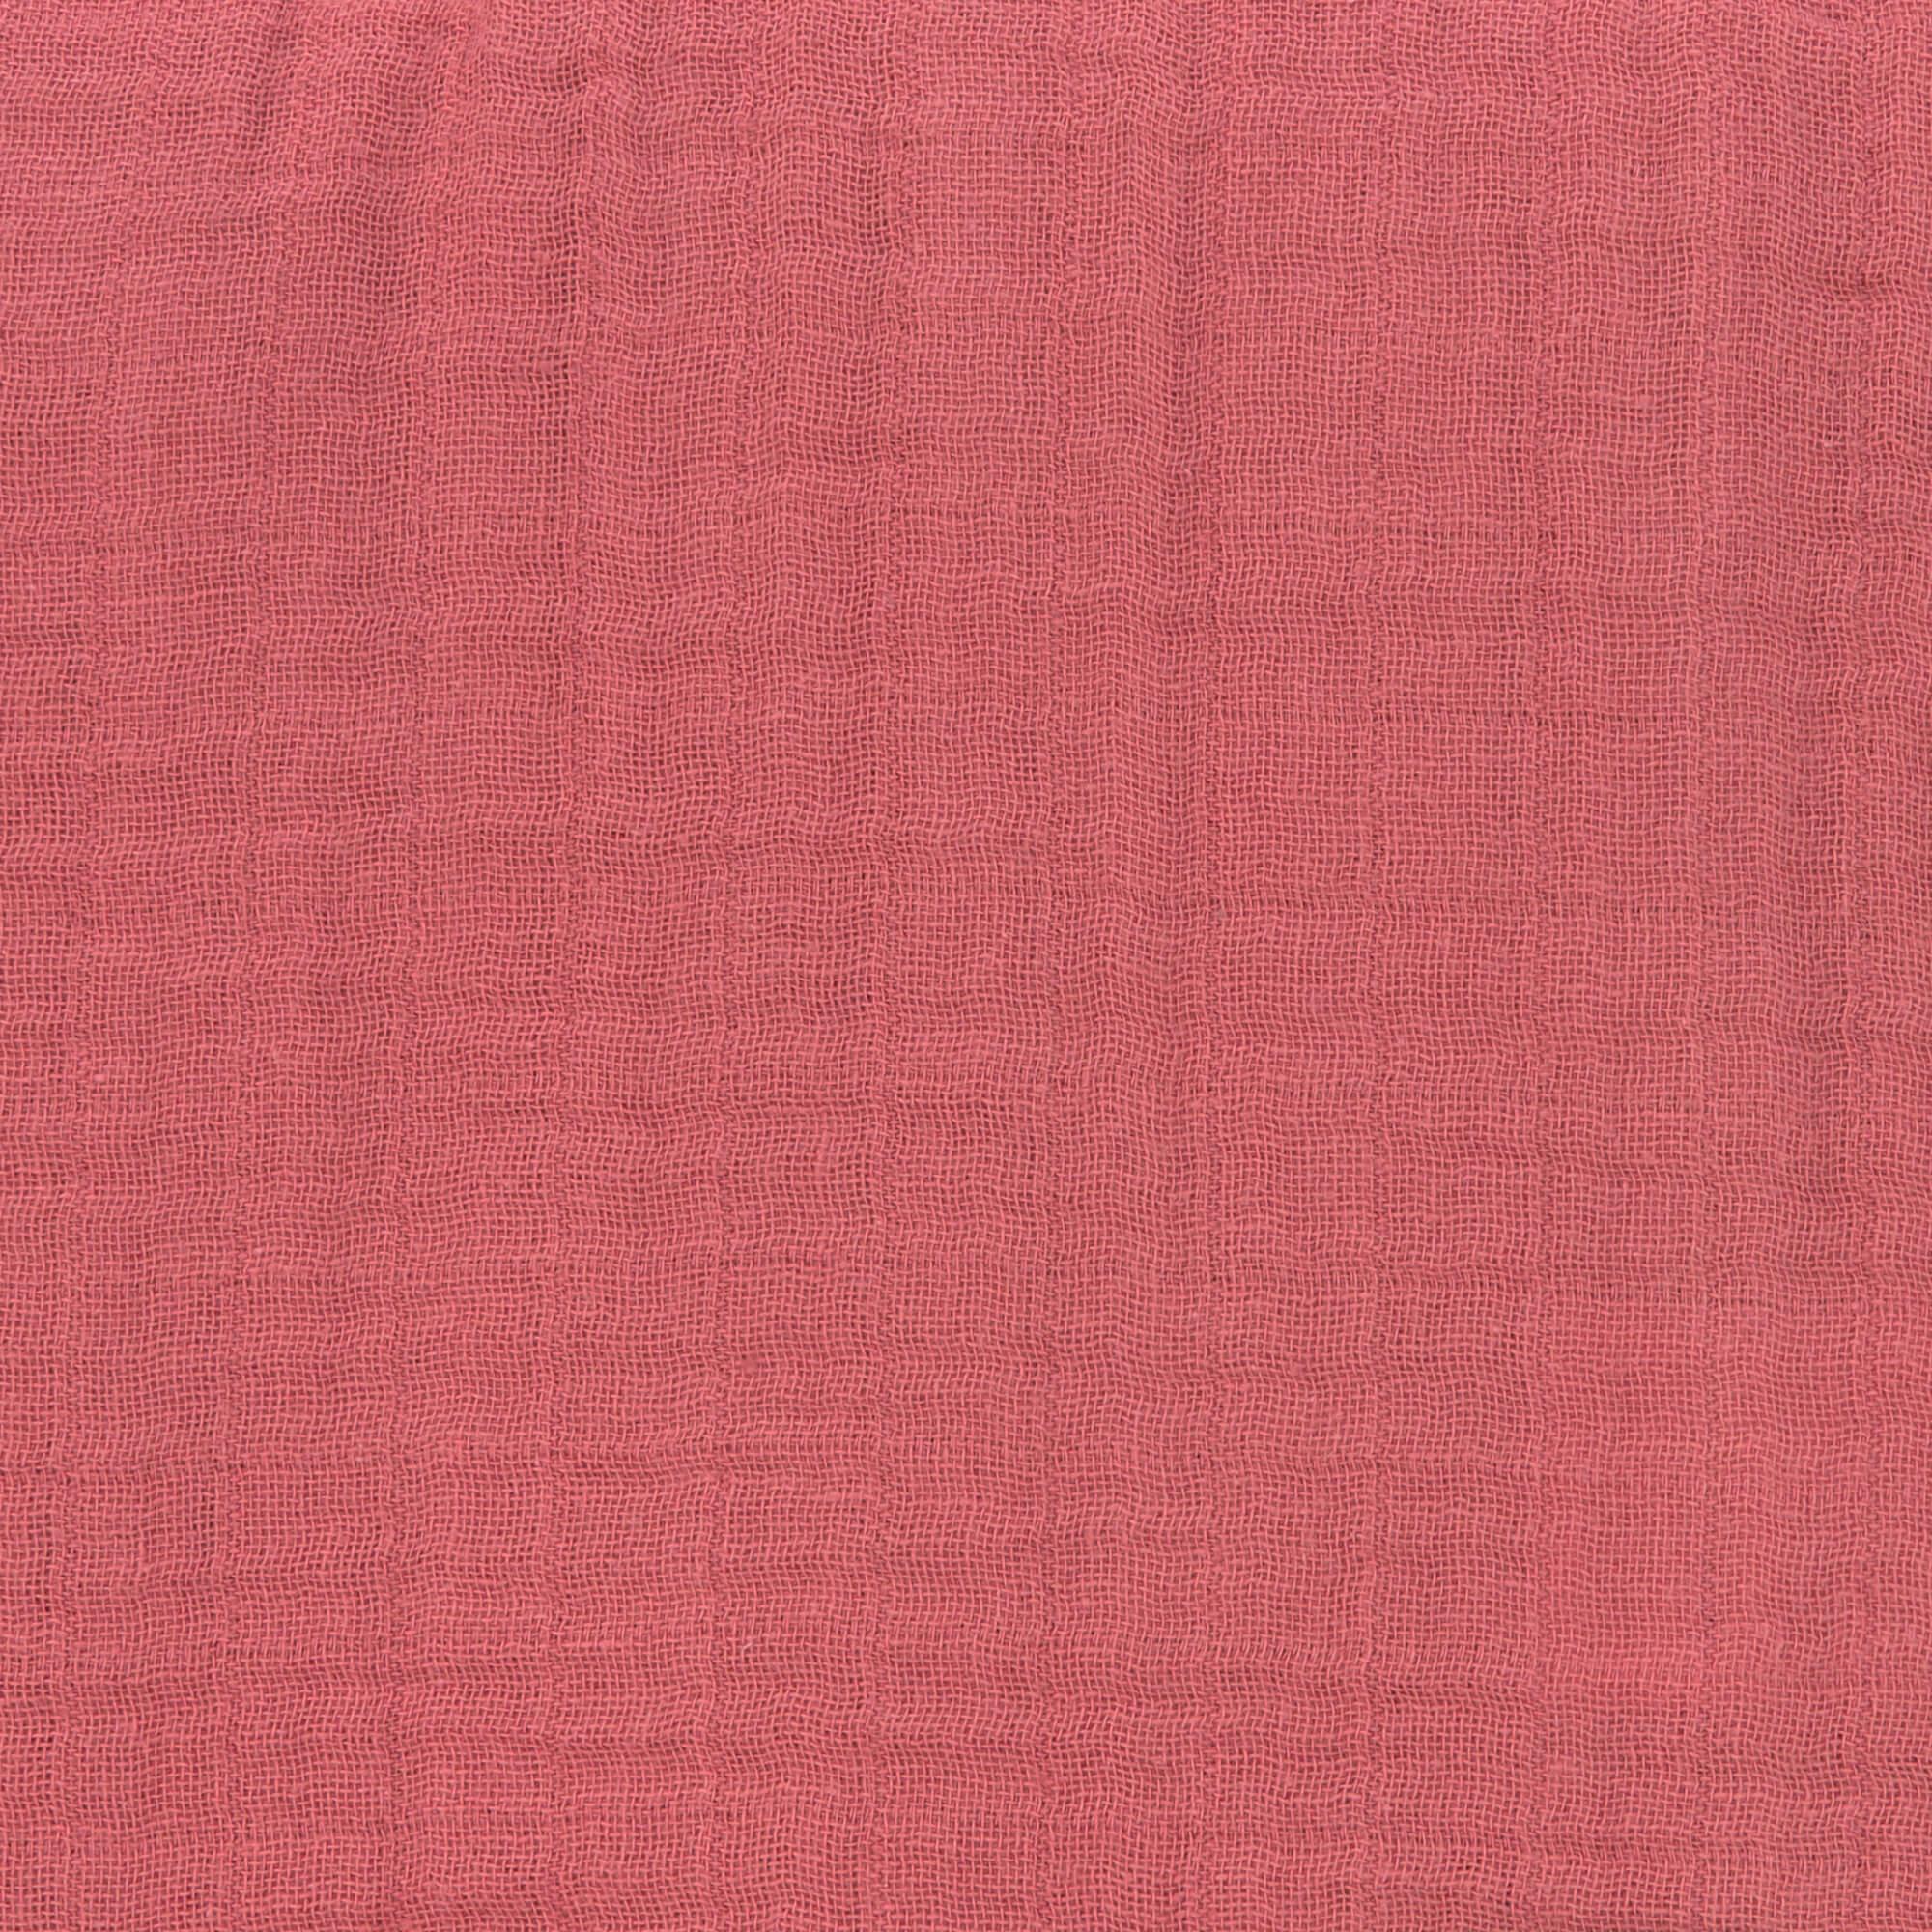 Stillschal Musselin - Rosewood - Lässig